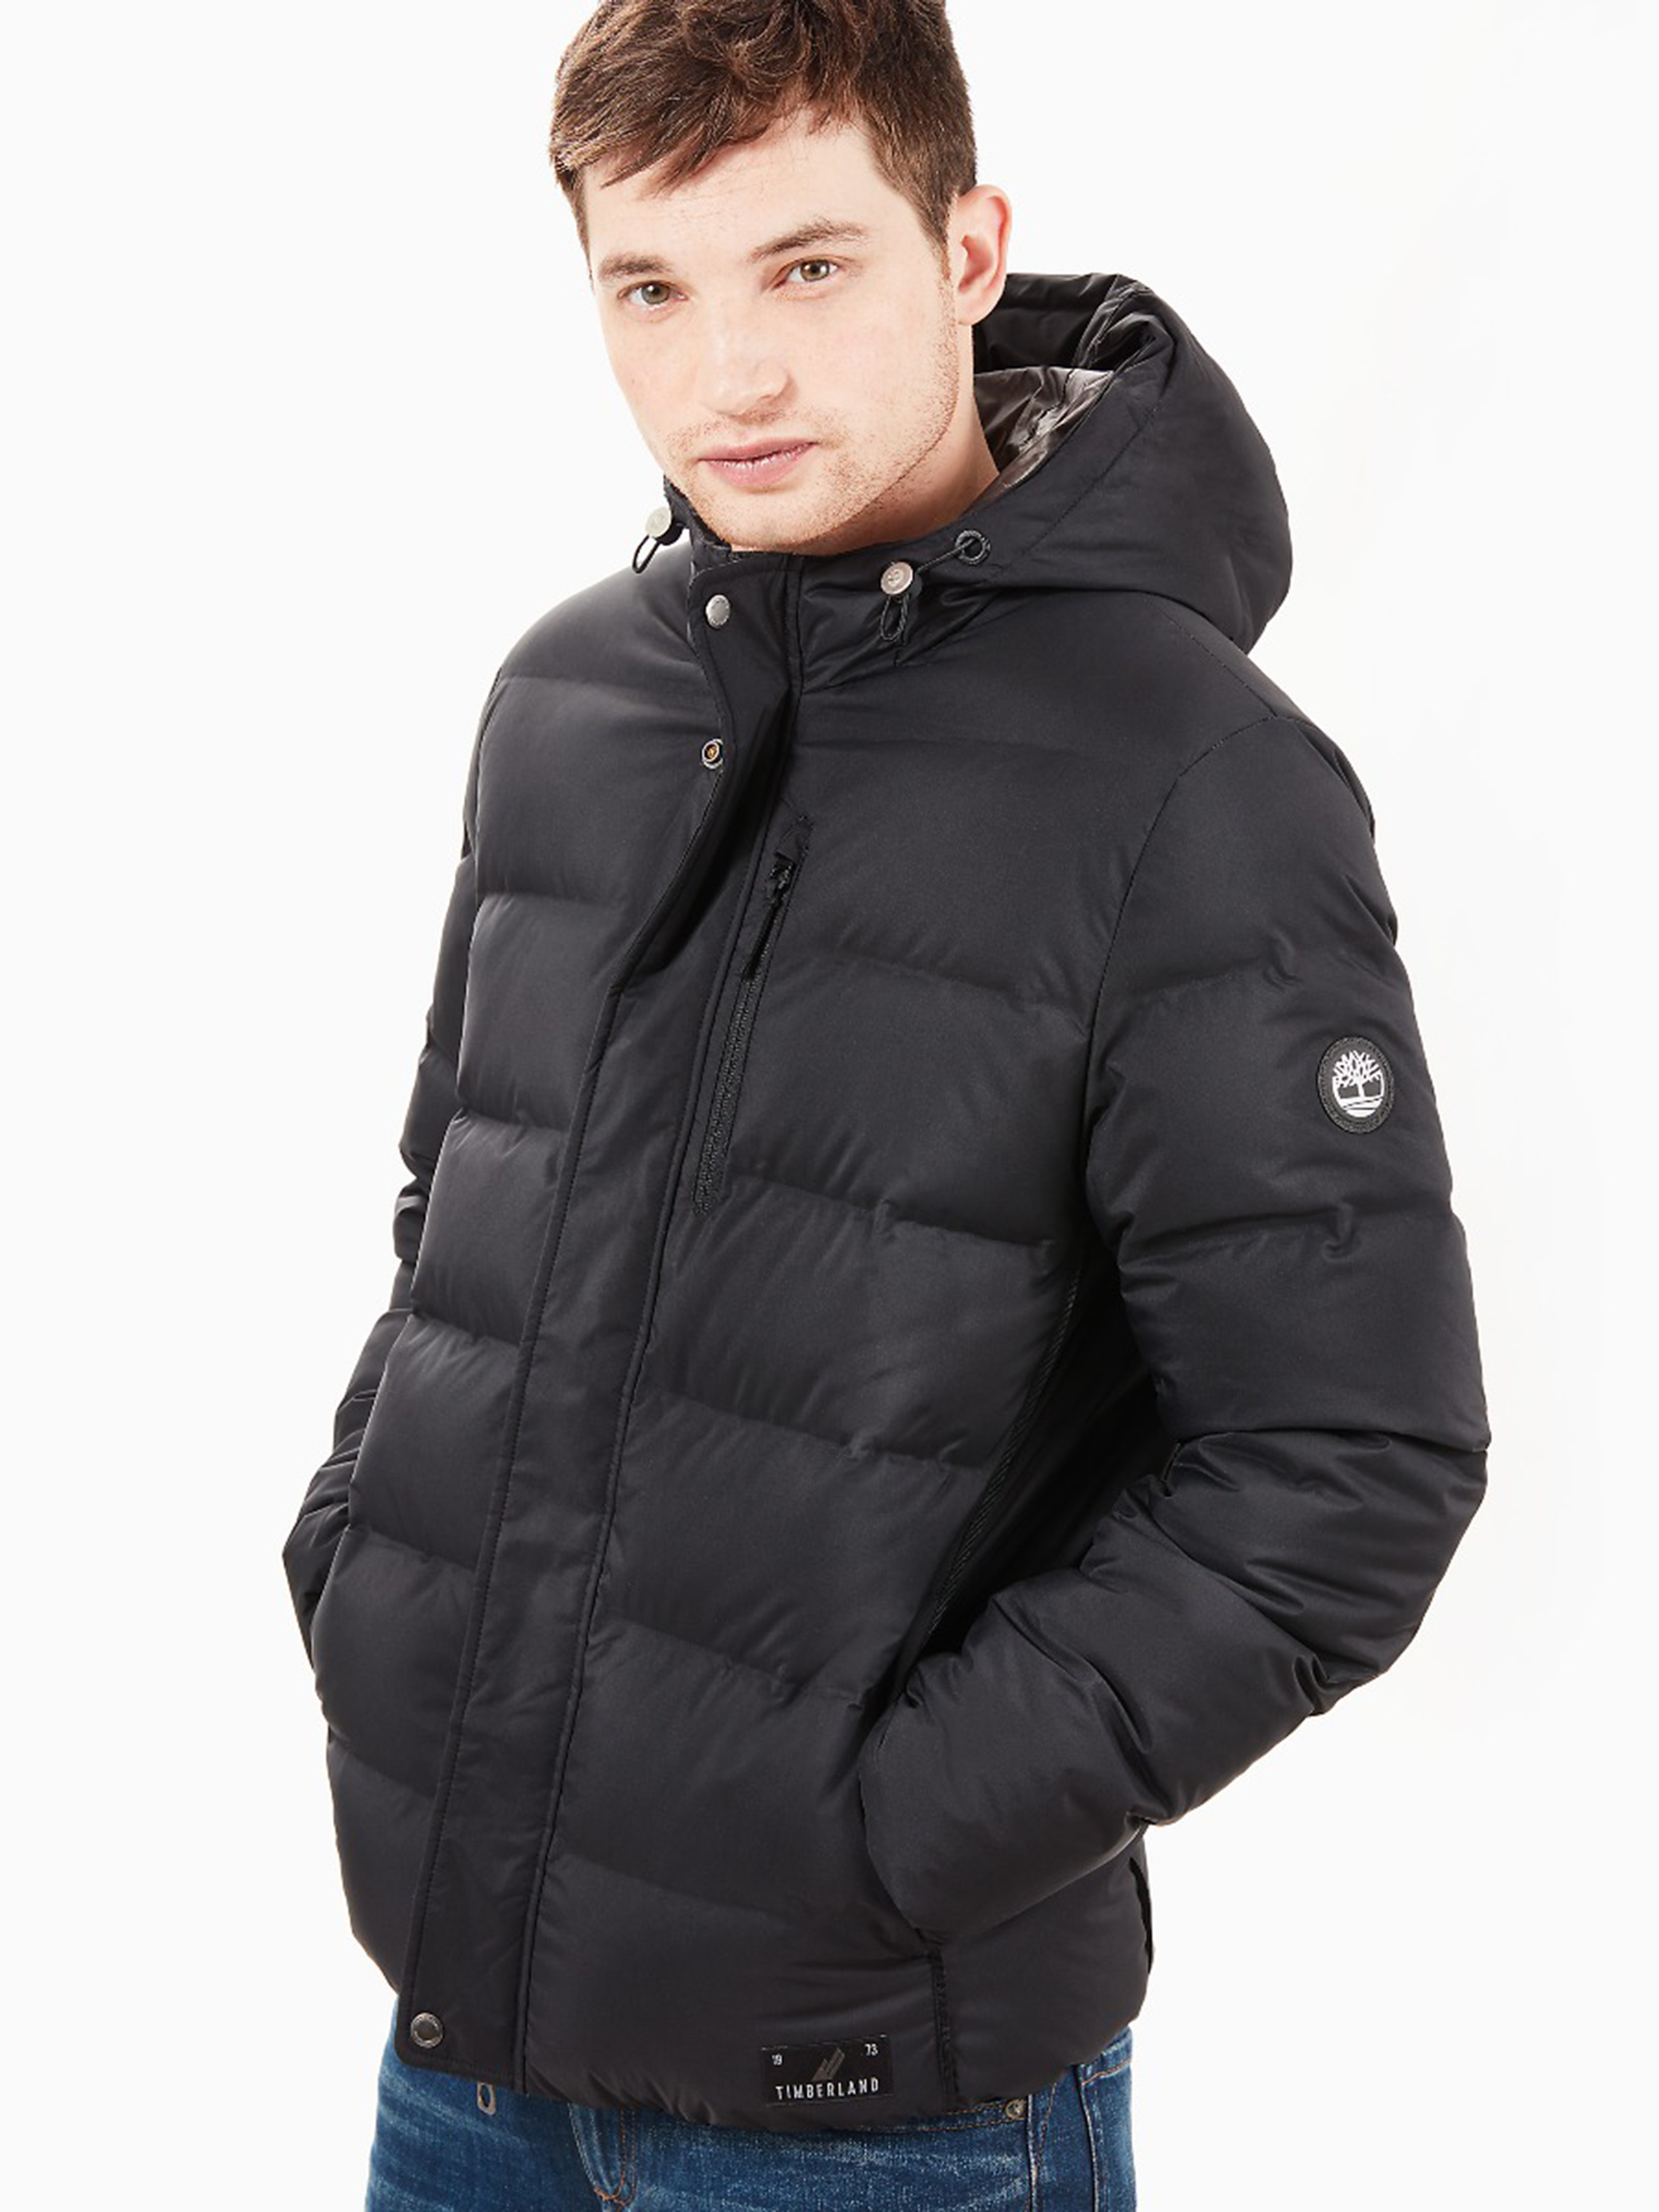 Куртка пуховая мужские Timberland модель TH5463 , 2017